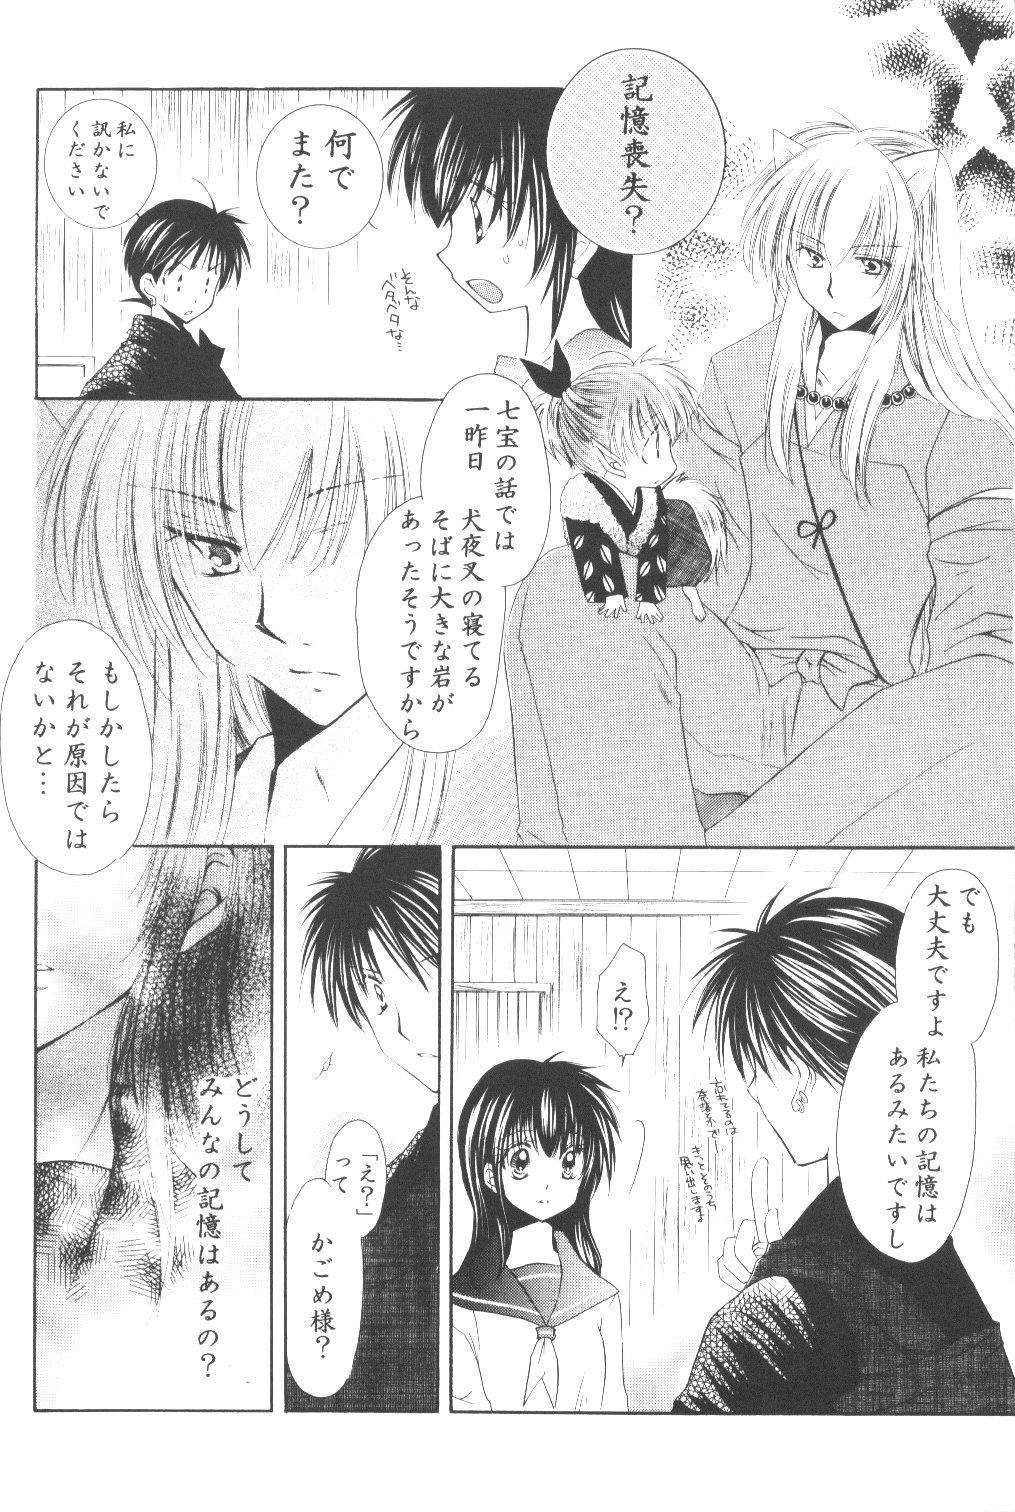 Ryuusei Ryodan 11